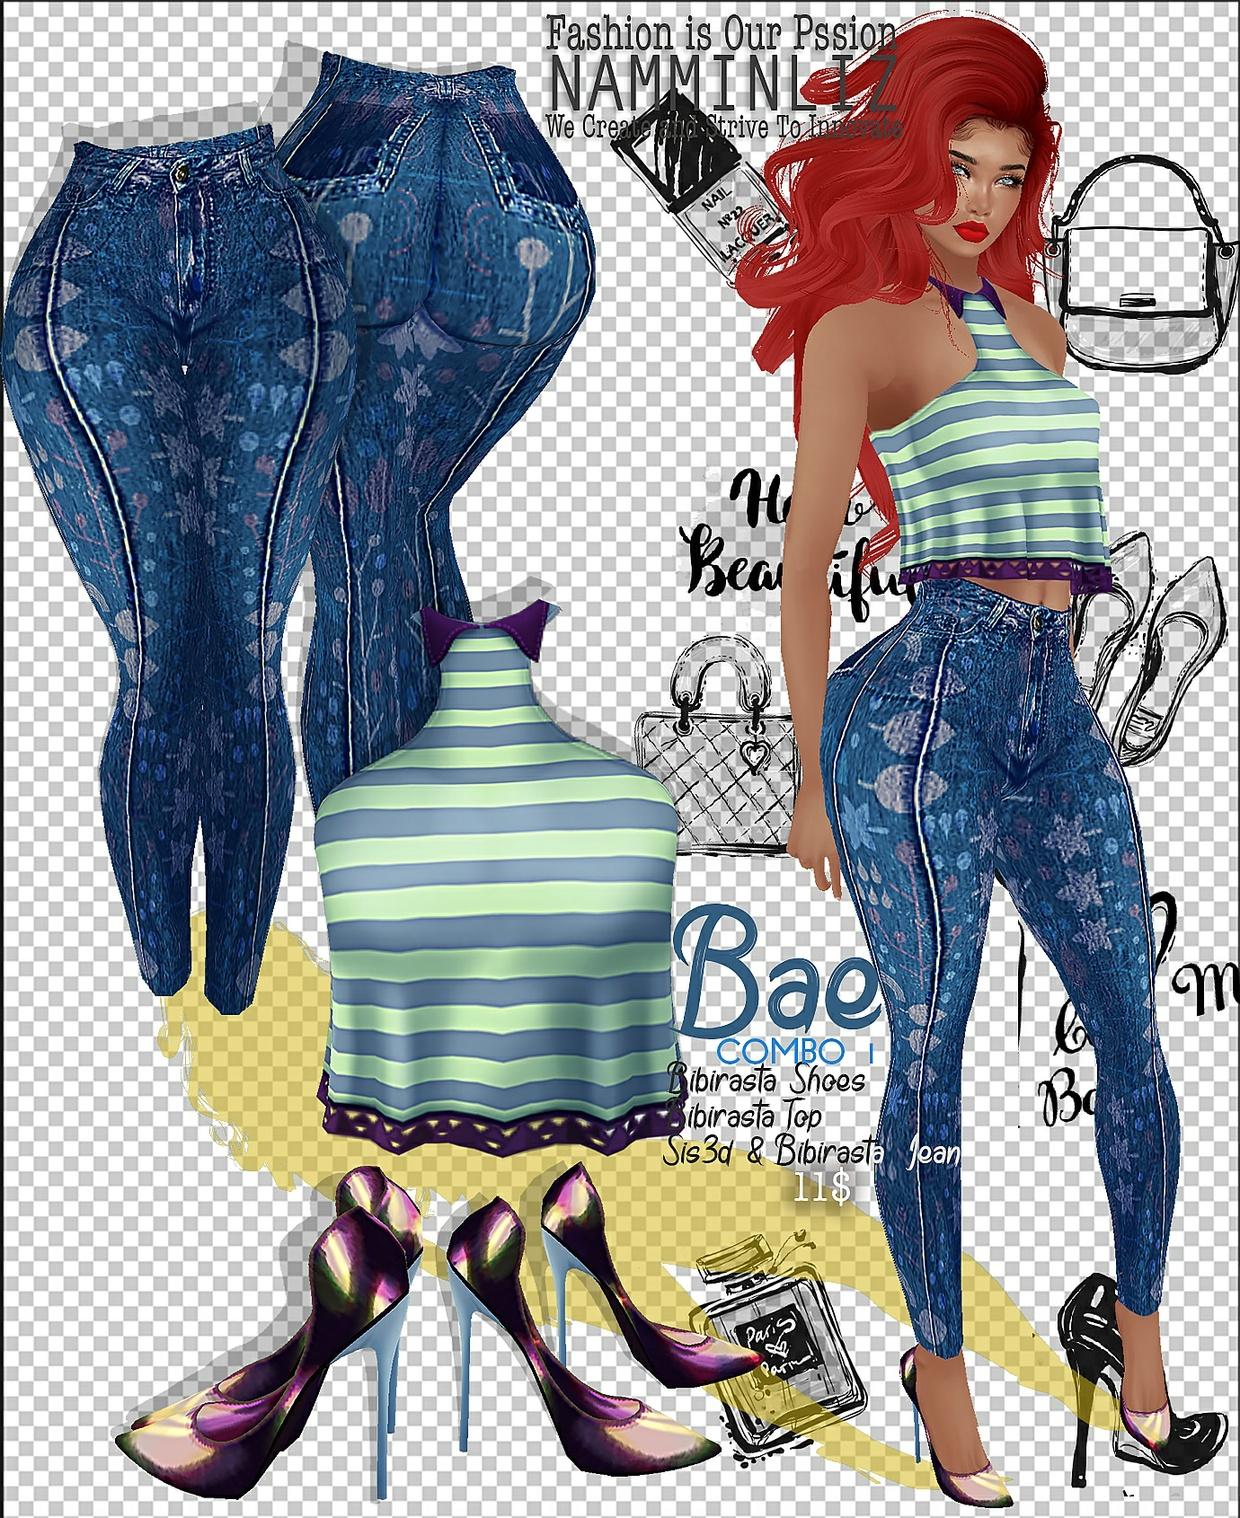 COMBO Bae1 Jeans sis3d & bibirasta +  Tops Bibirasta +  Shoes Bibirasta All Sizes